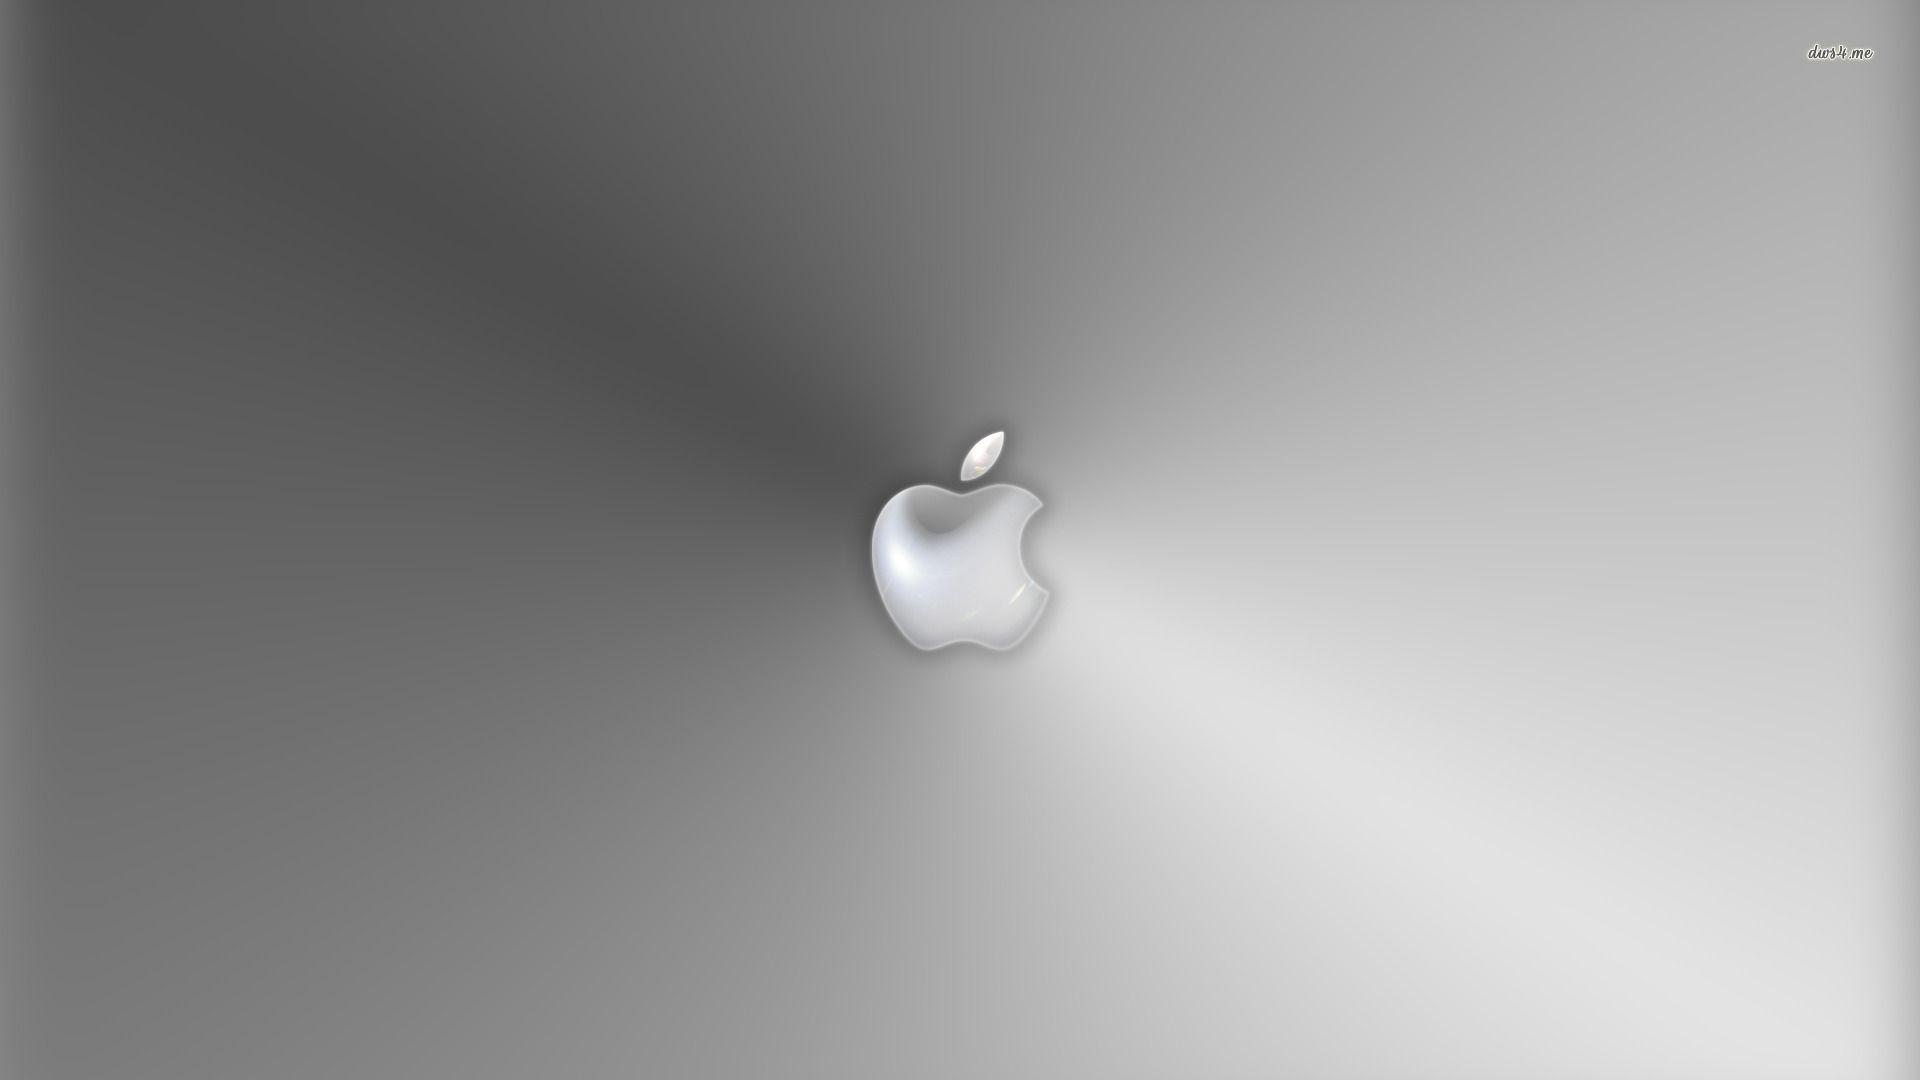 Apple Ipad desktop background free